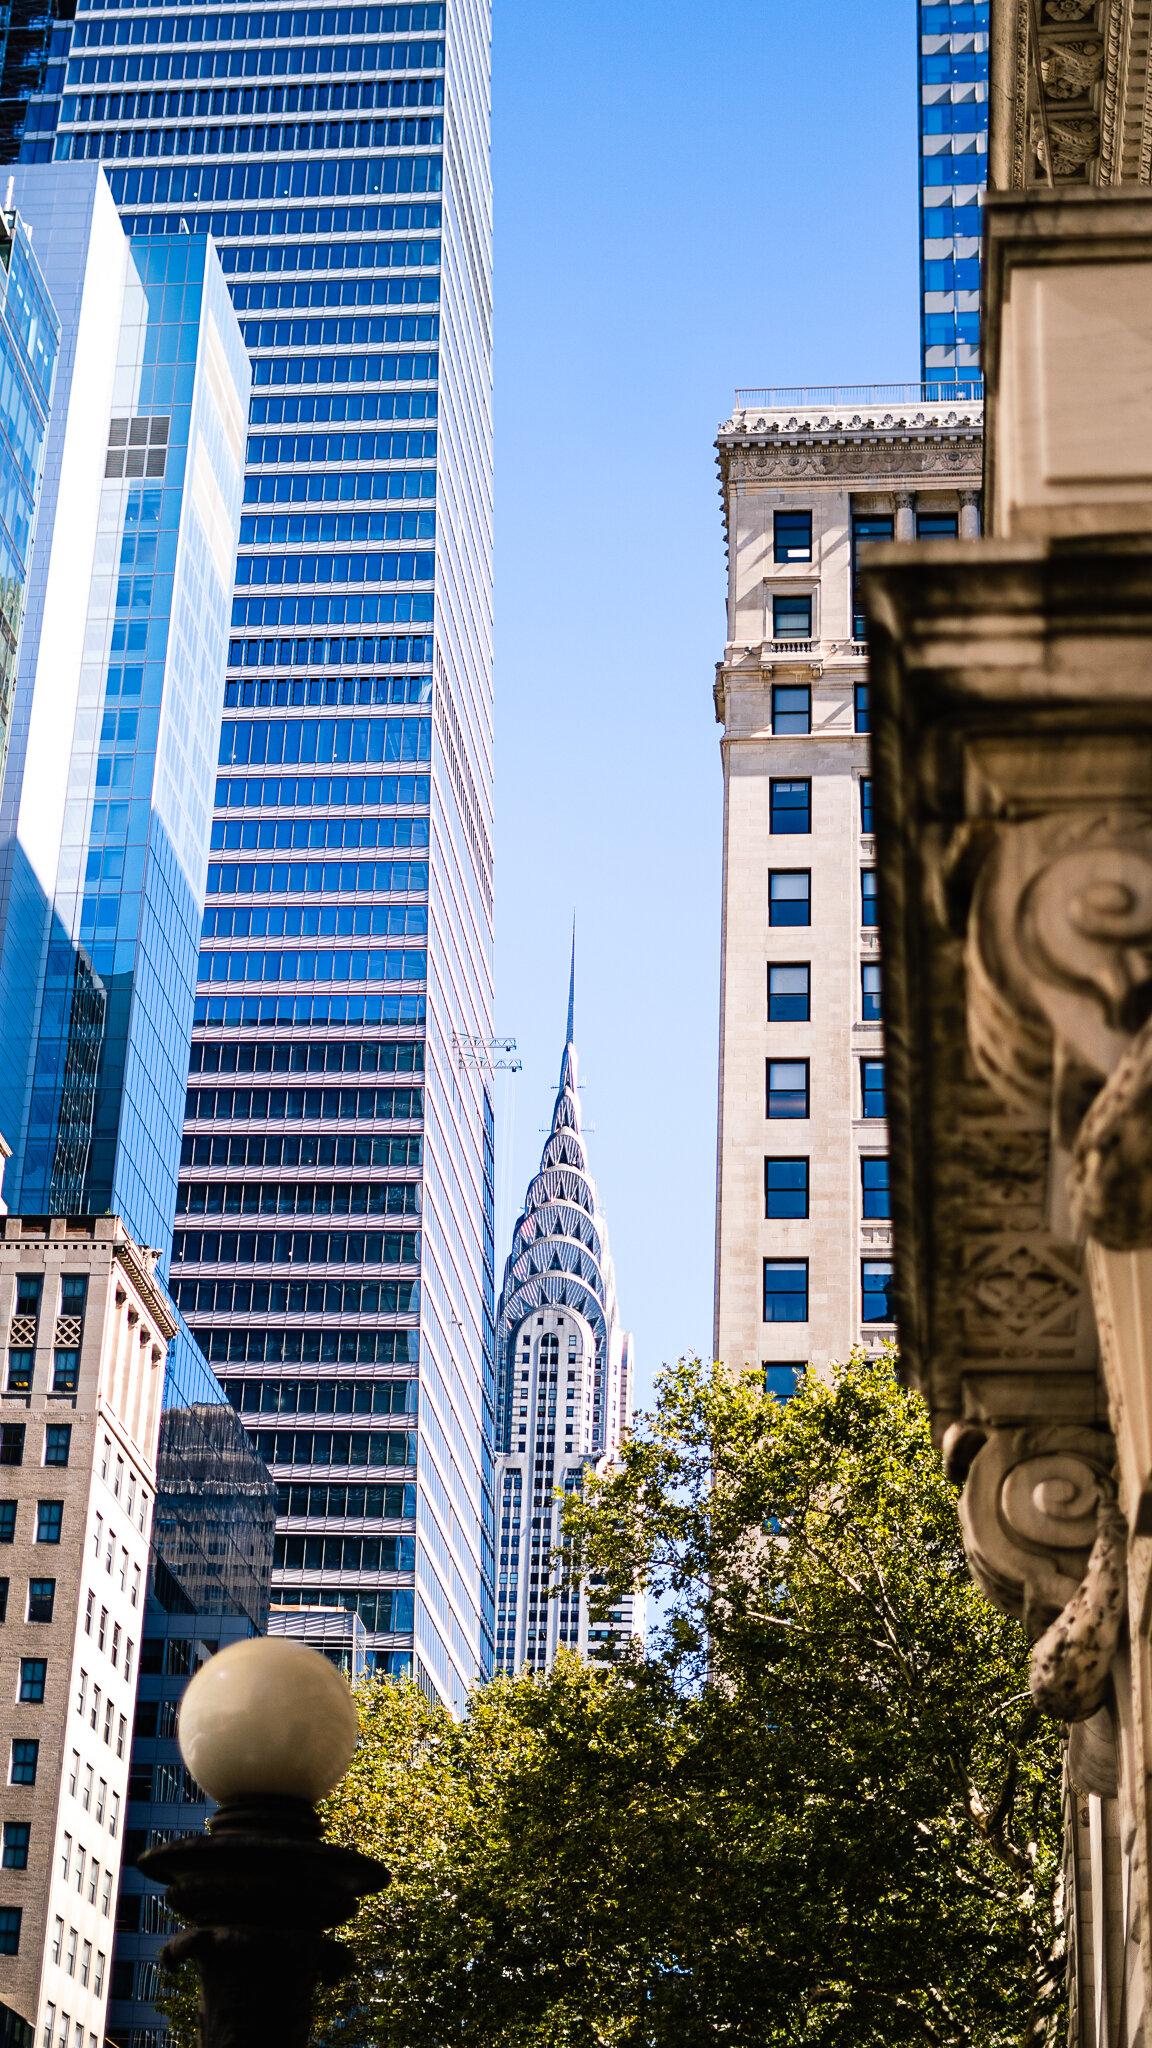 NYC-0223-VictureProd.jpg